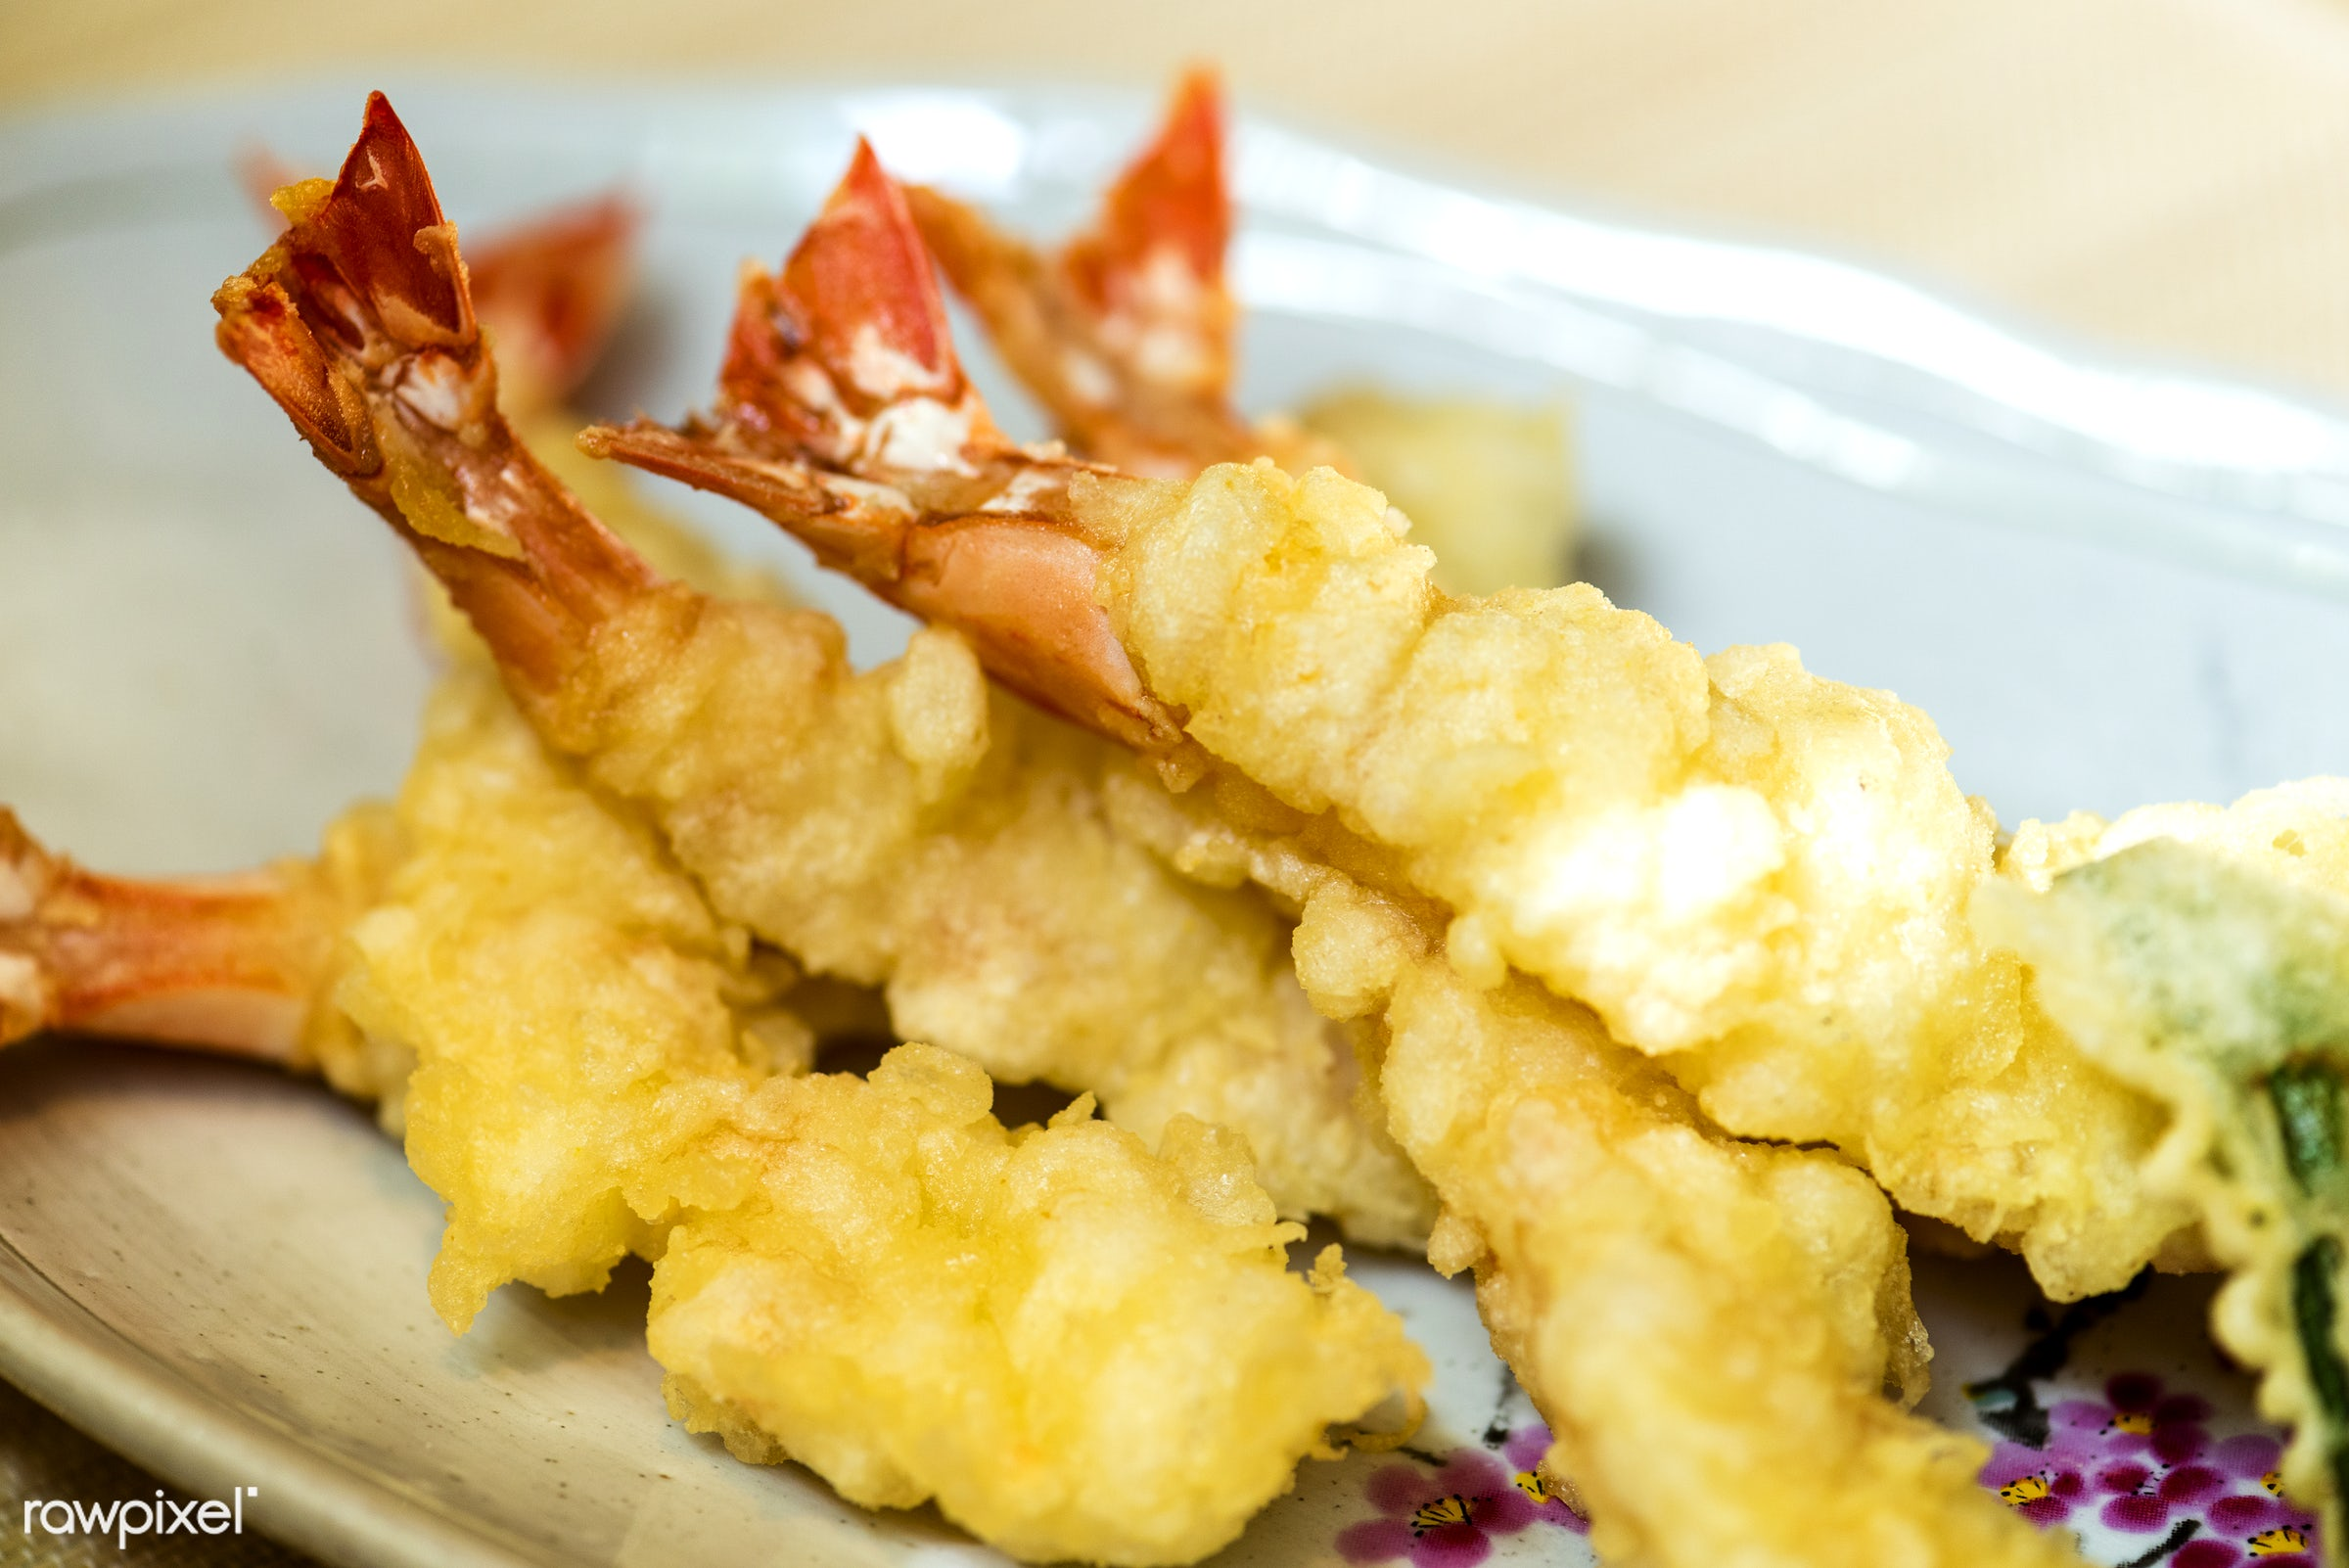 japanese, asian, closeup, crispy tempura battered prawns, cuisine, delicious, eating, food, fresh, gourmet, healthy,...